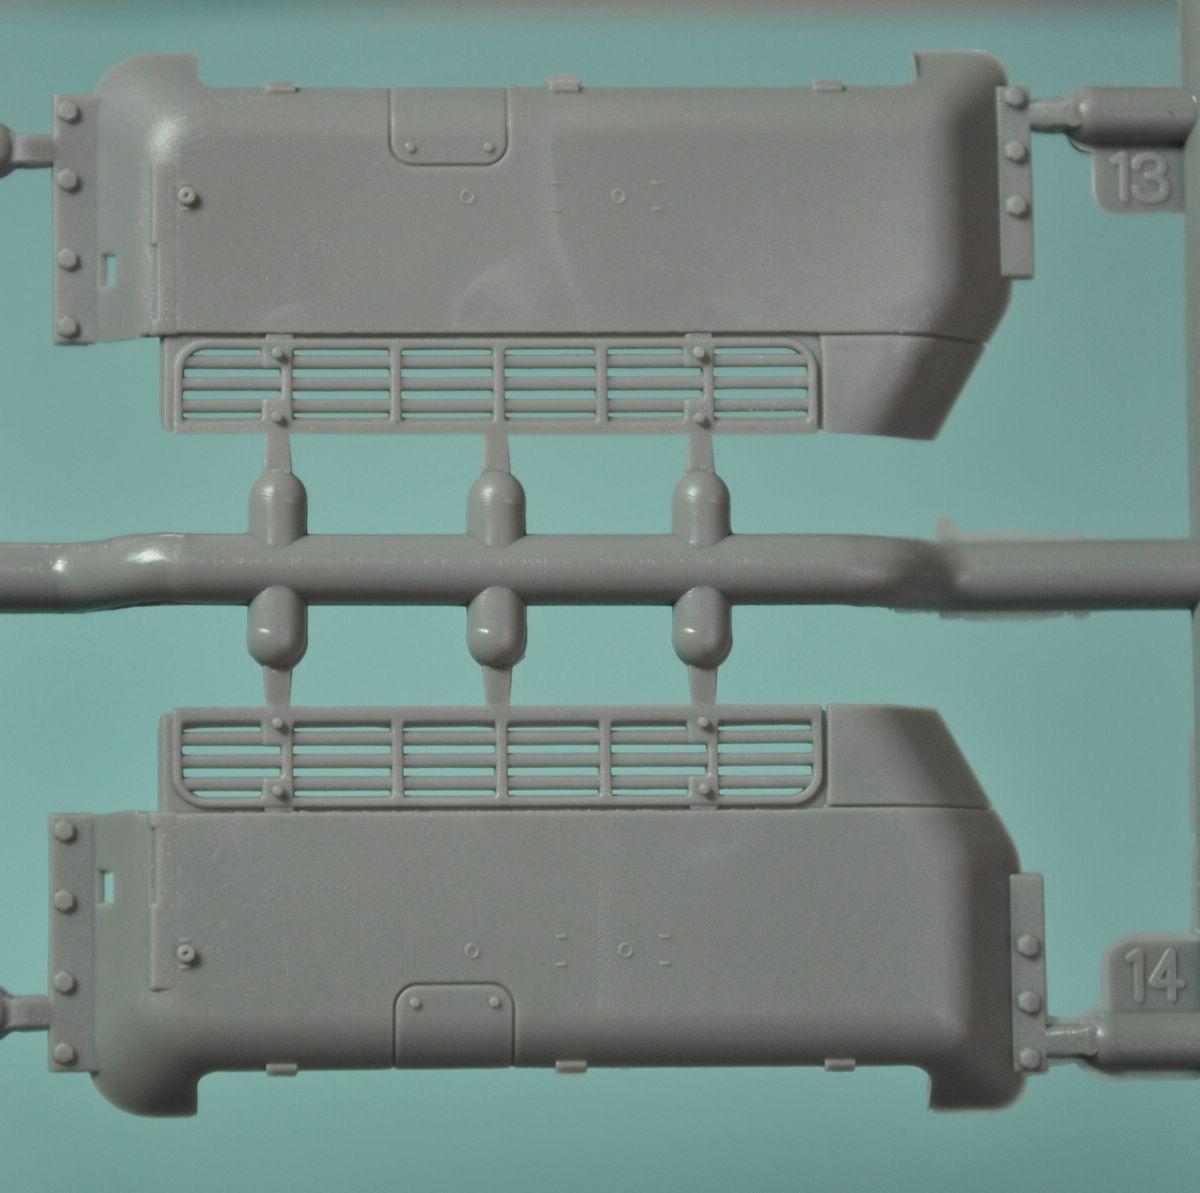 MiniArt-35175-Su-122-4 SU-122 Initial Production von MiniArt im Maßstab 1:35 (# 35175)